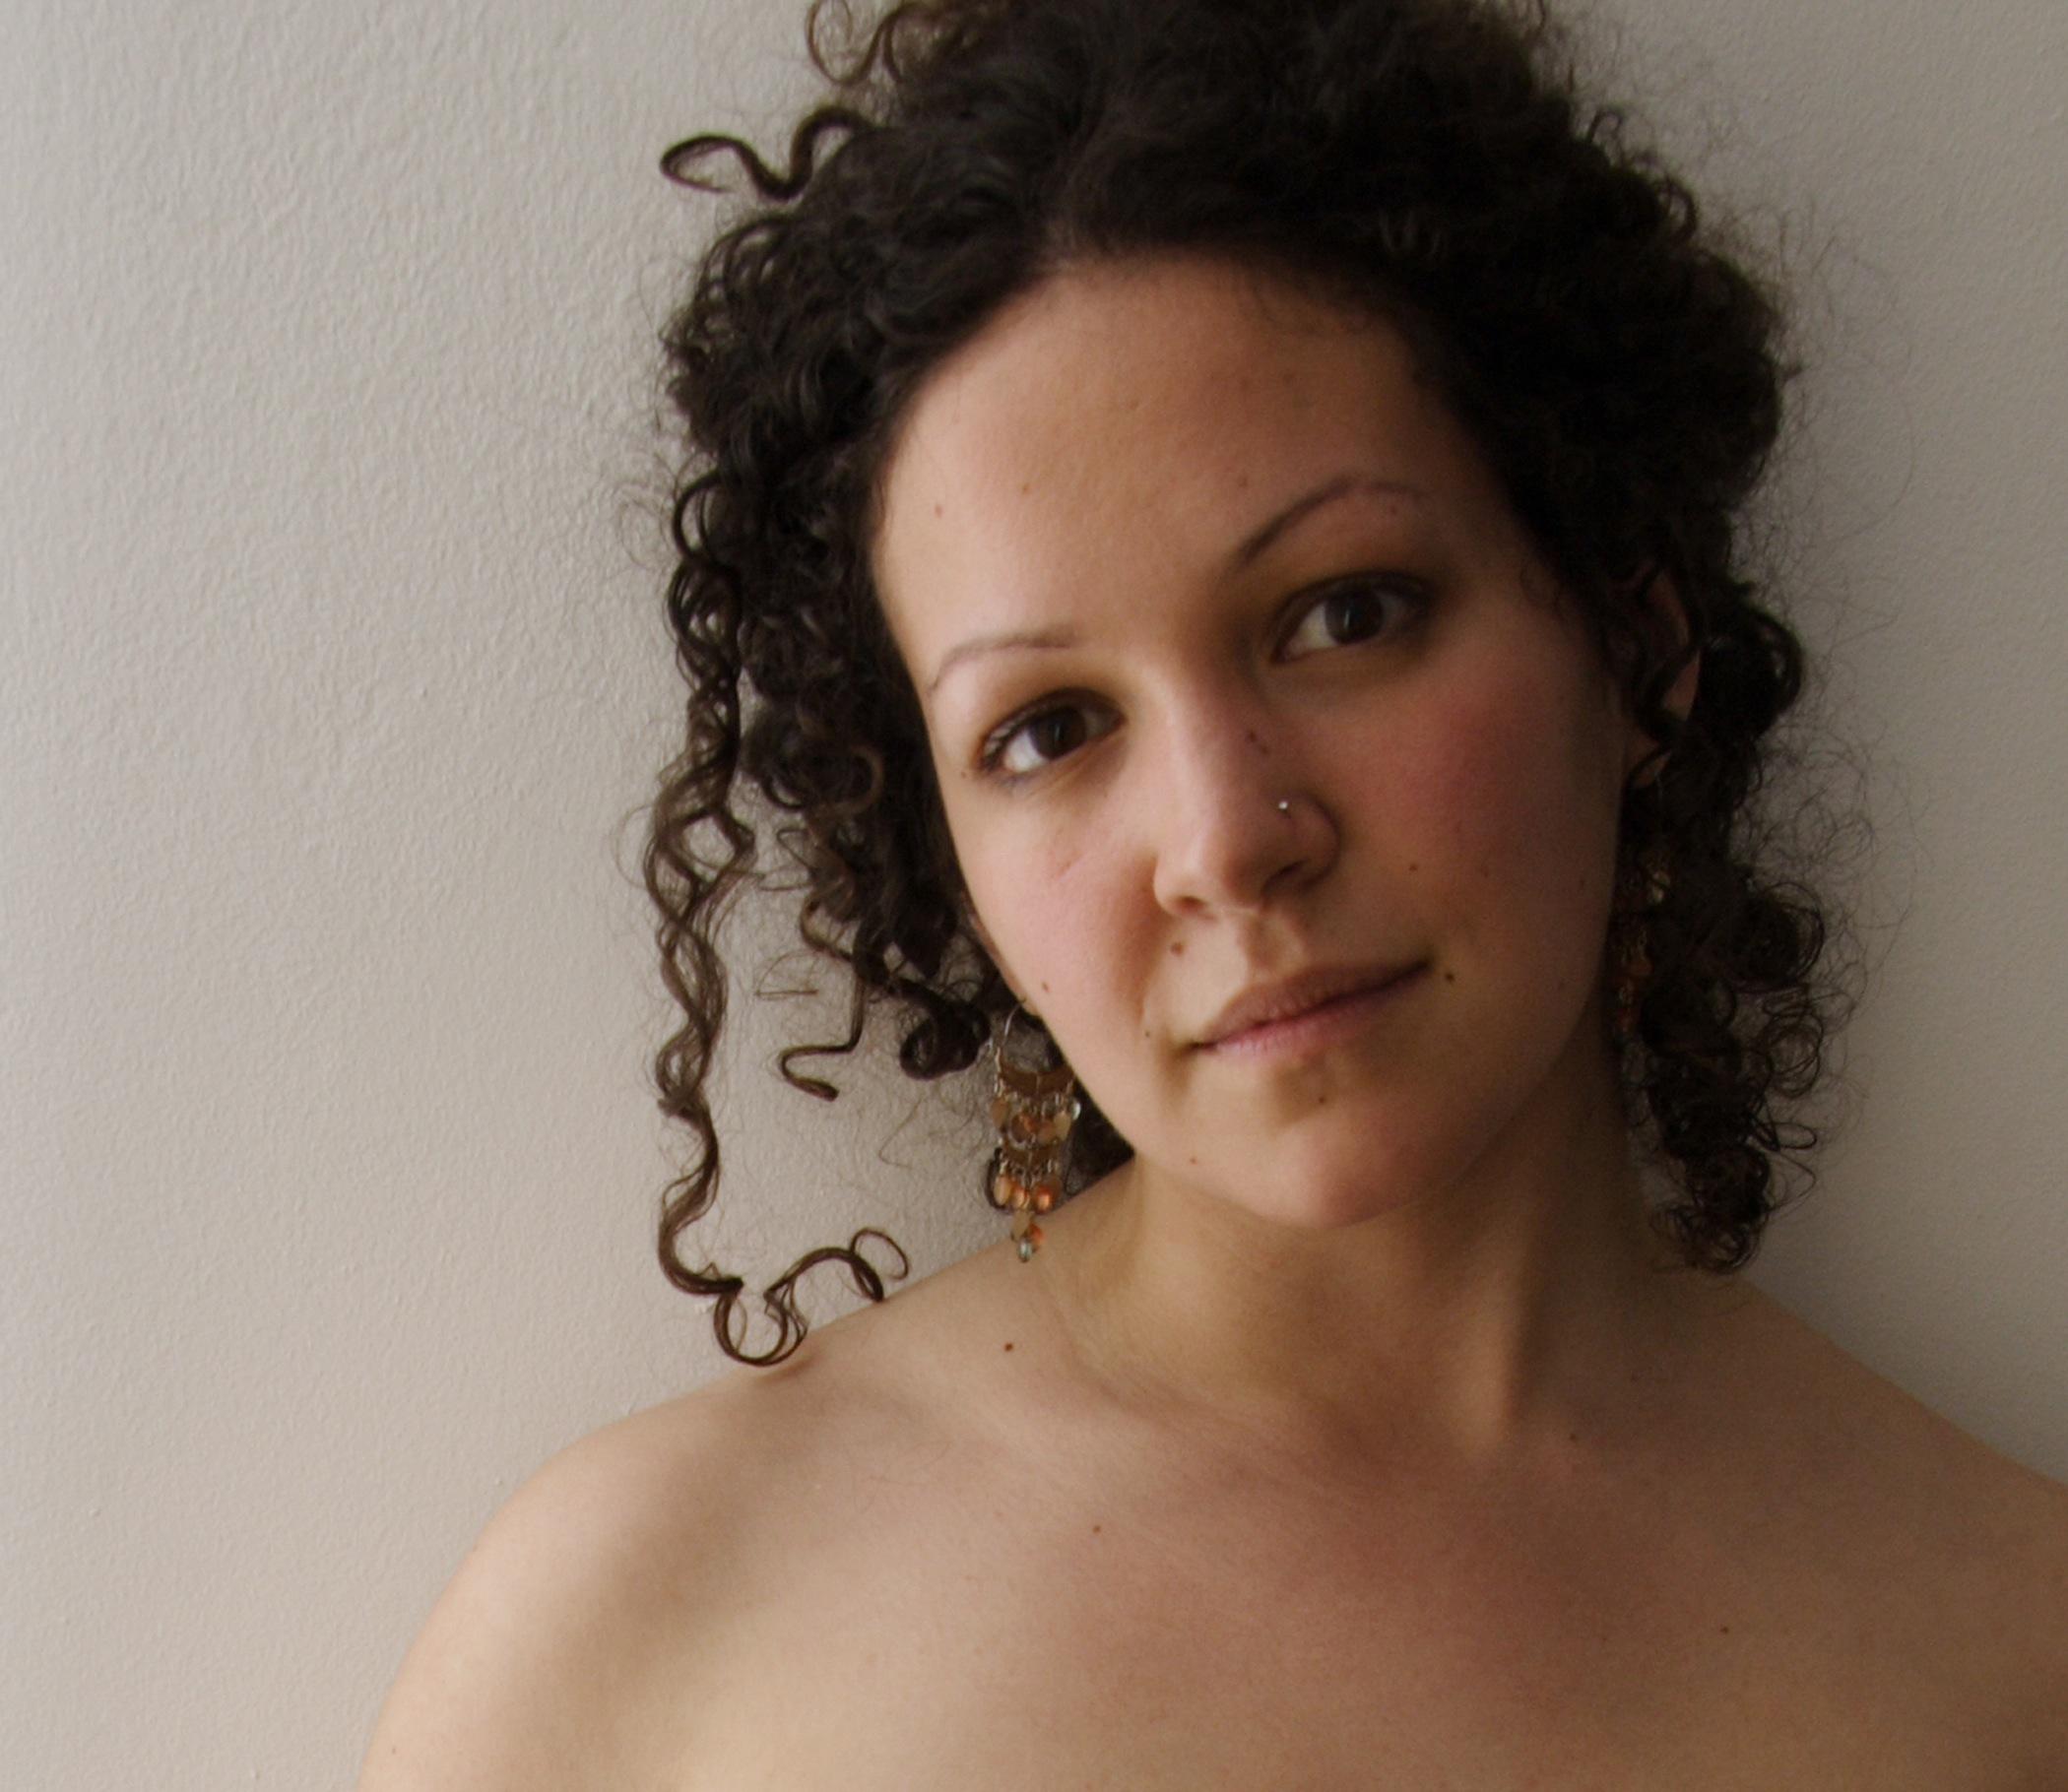 redhead tattoo naked girl